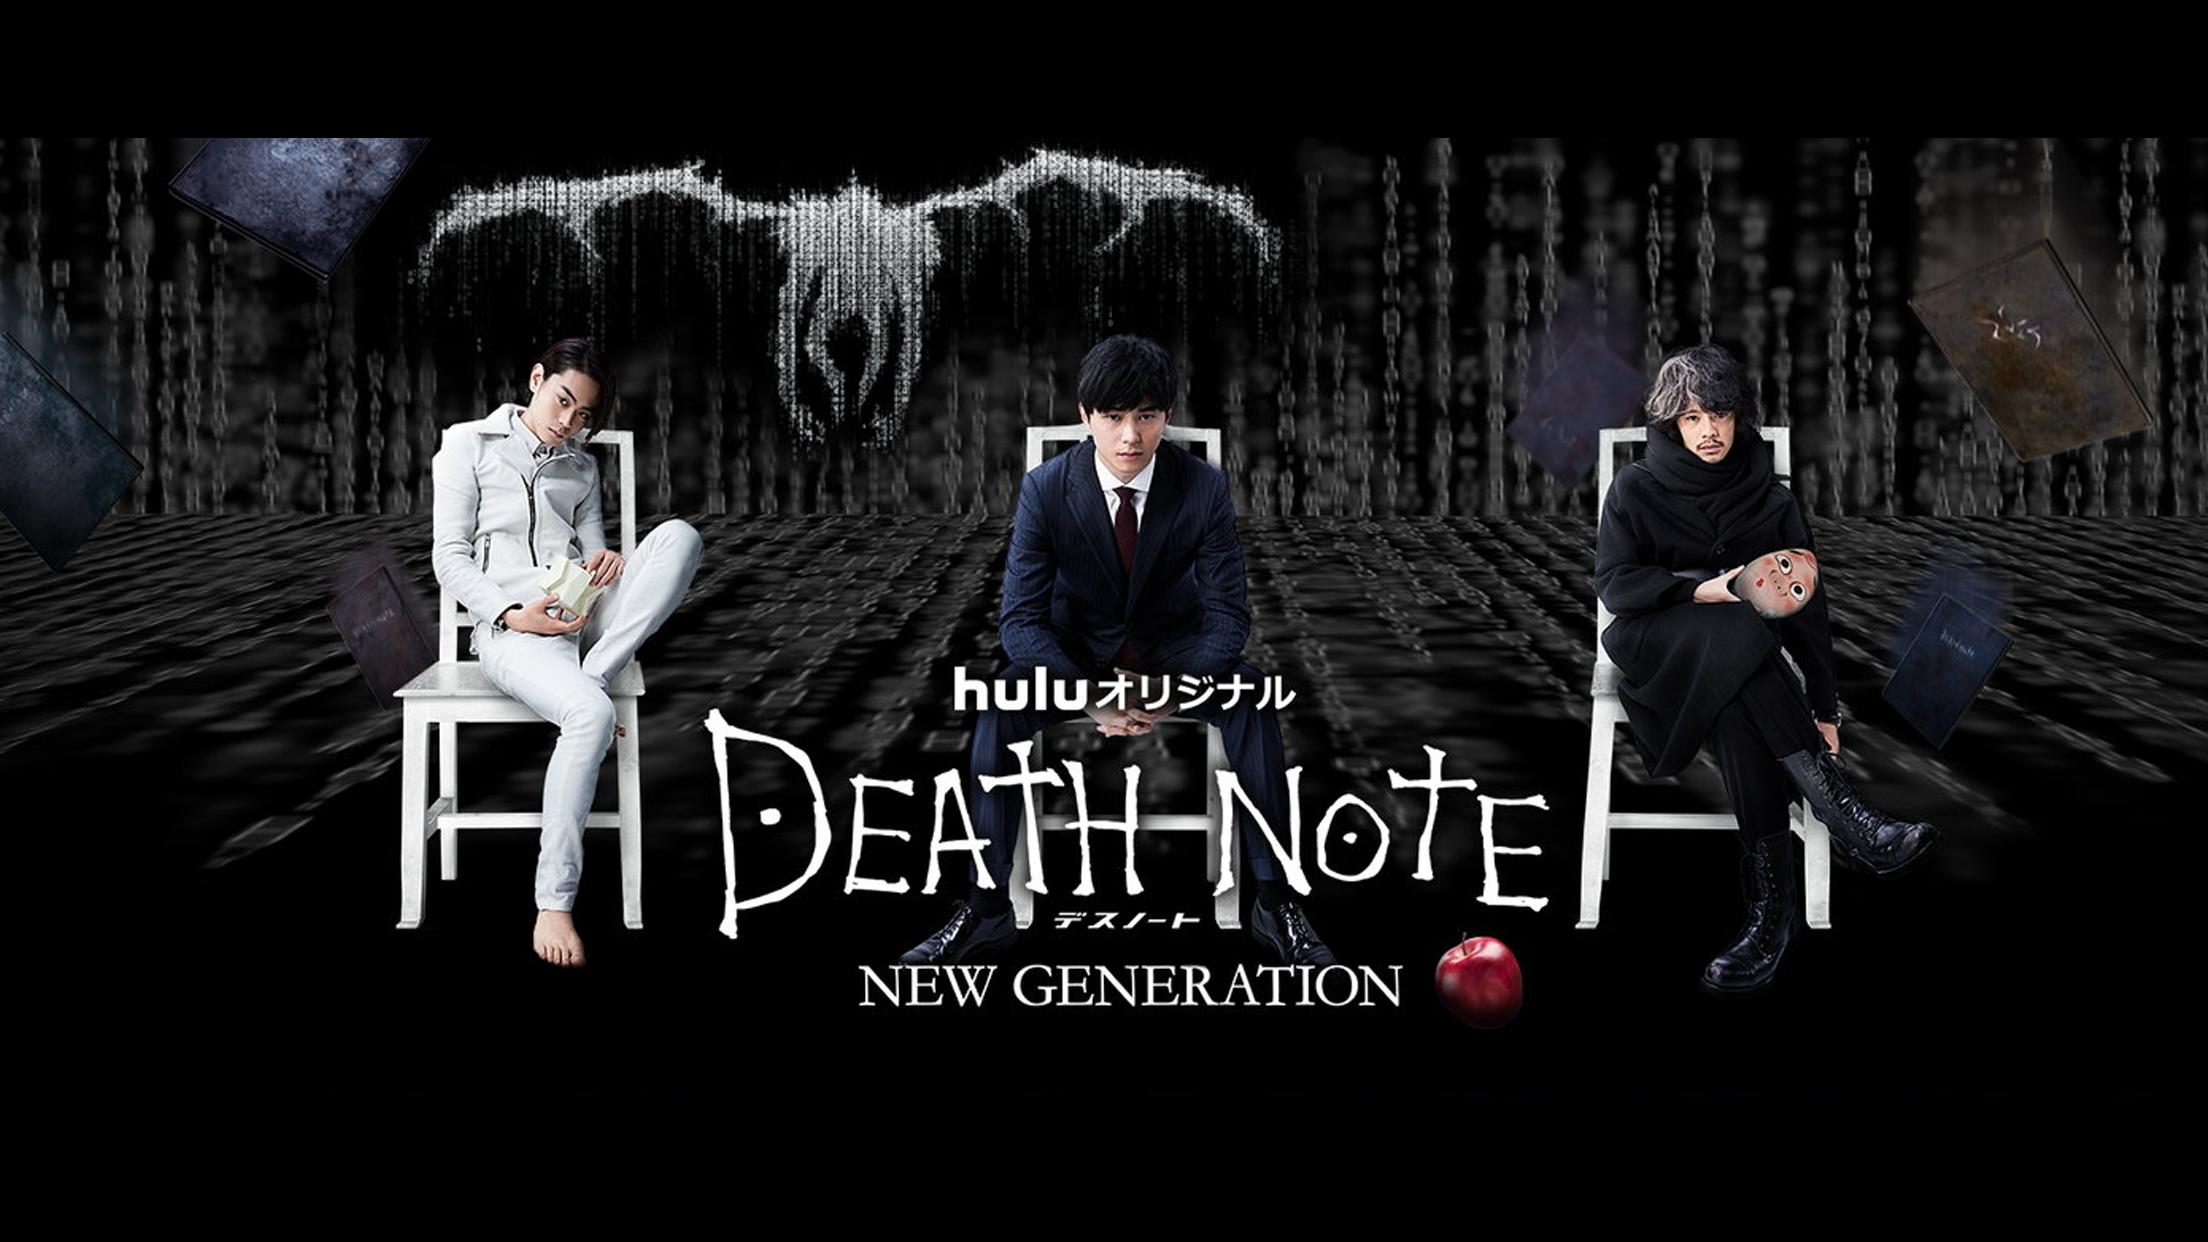 DEATHNOTE NEW GENERATION